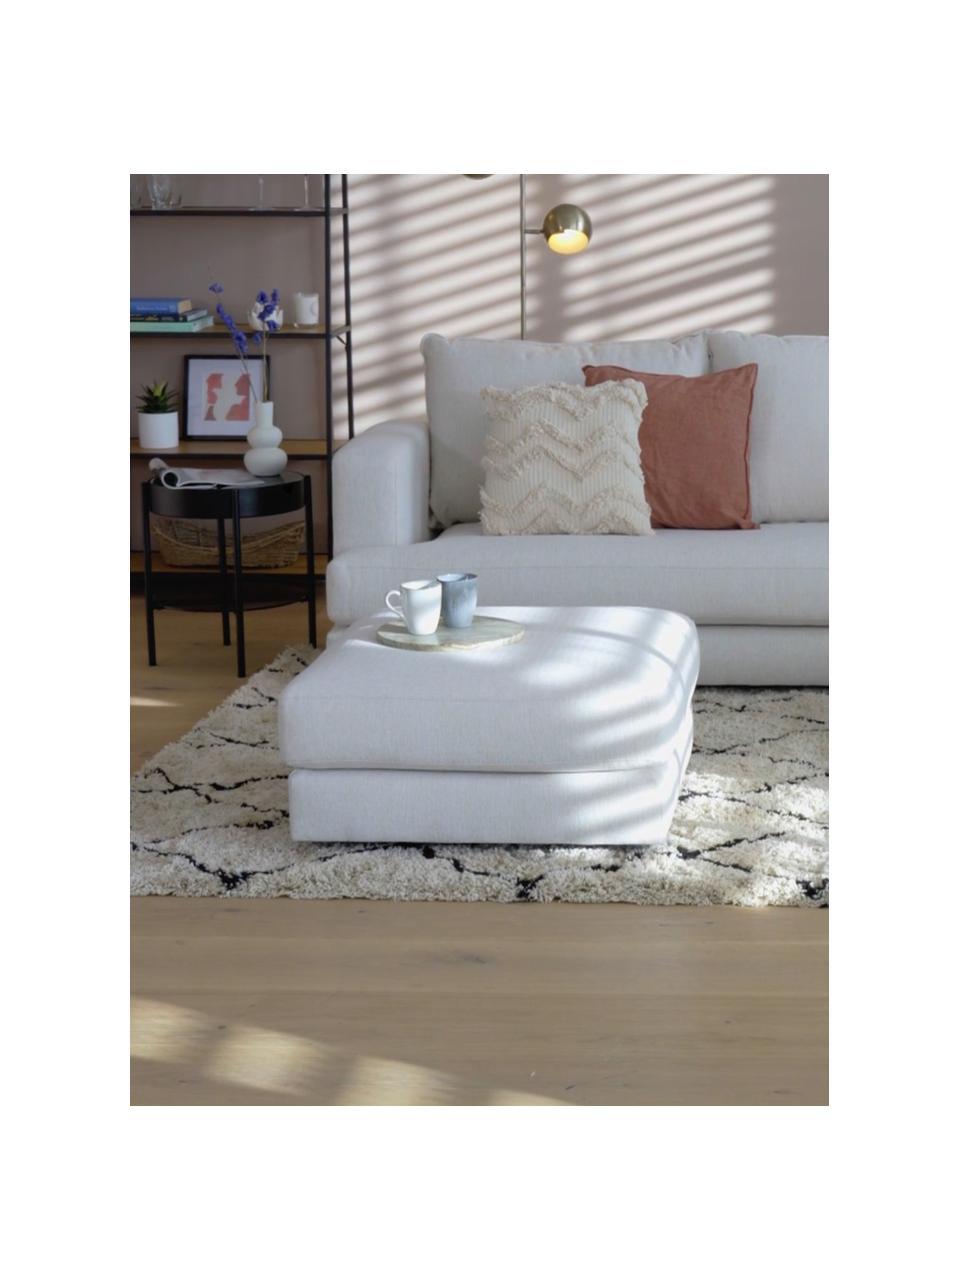 Sofa-Hocker Tribeca in Beige, Bezug: Polyester Der hochwertige, Gestell: Massives Kiefernholz, Füße: Massives Buchenholz, lack, Webstoff Beige, 80 x 40 cm